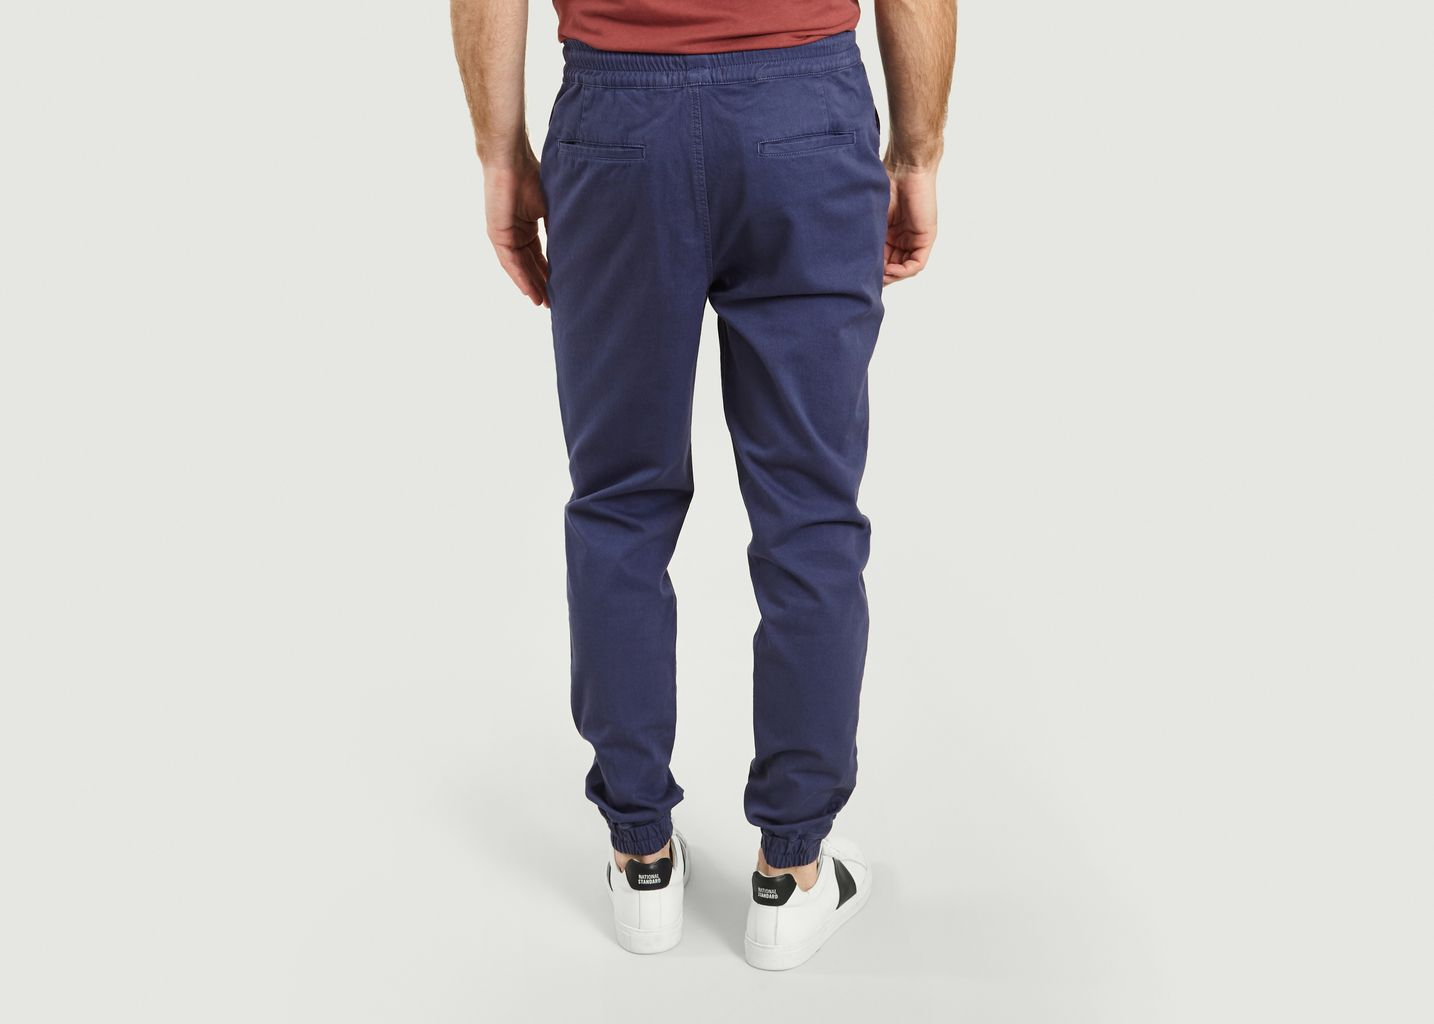 Pantalon Baroudeur 20 - Olow